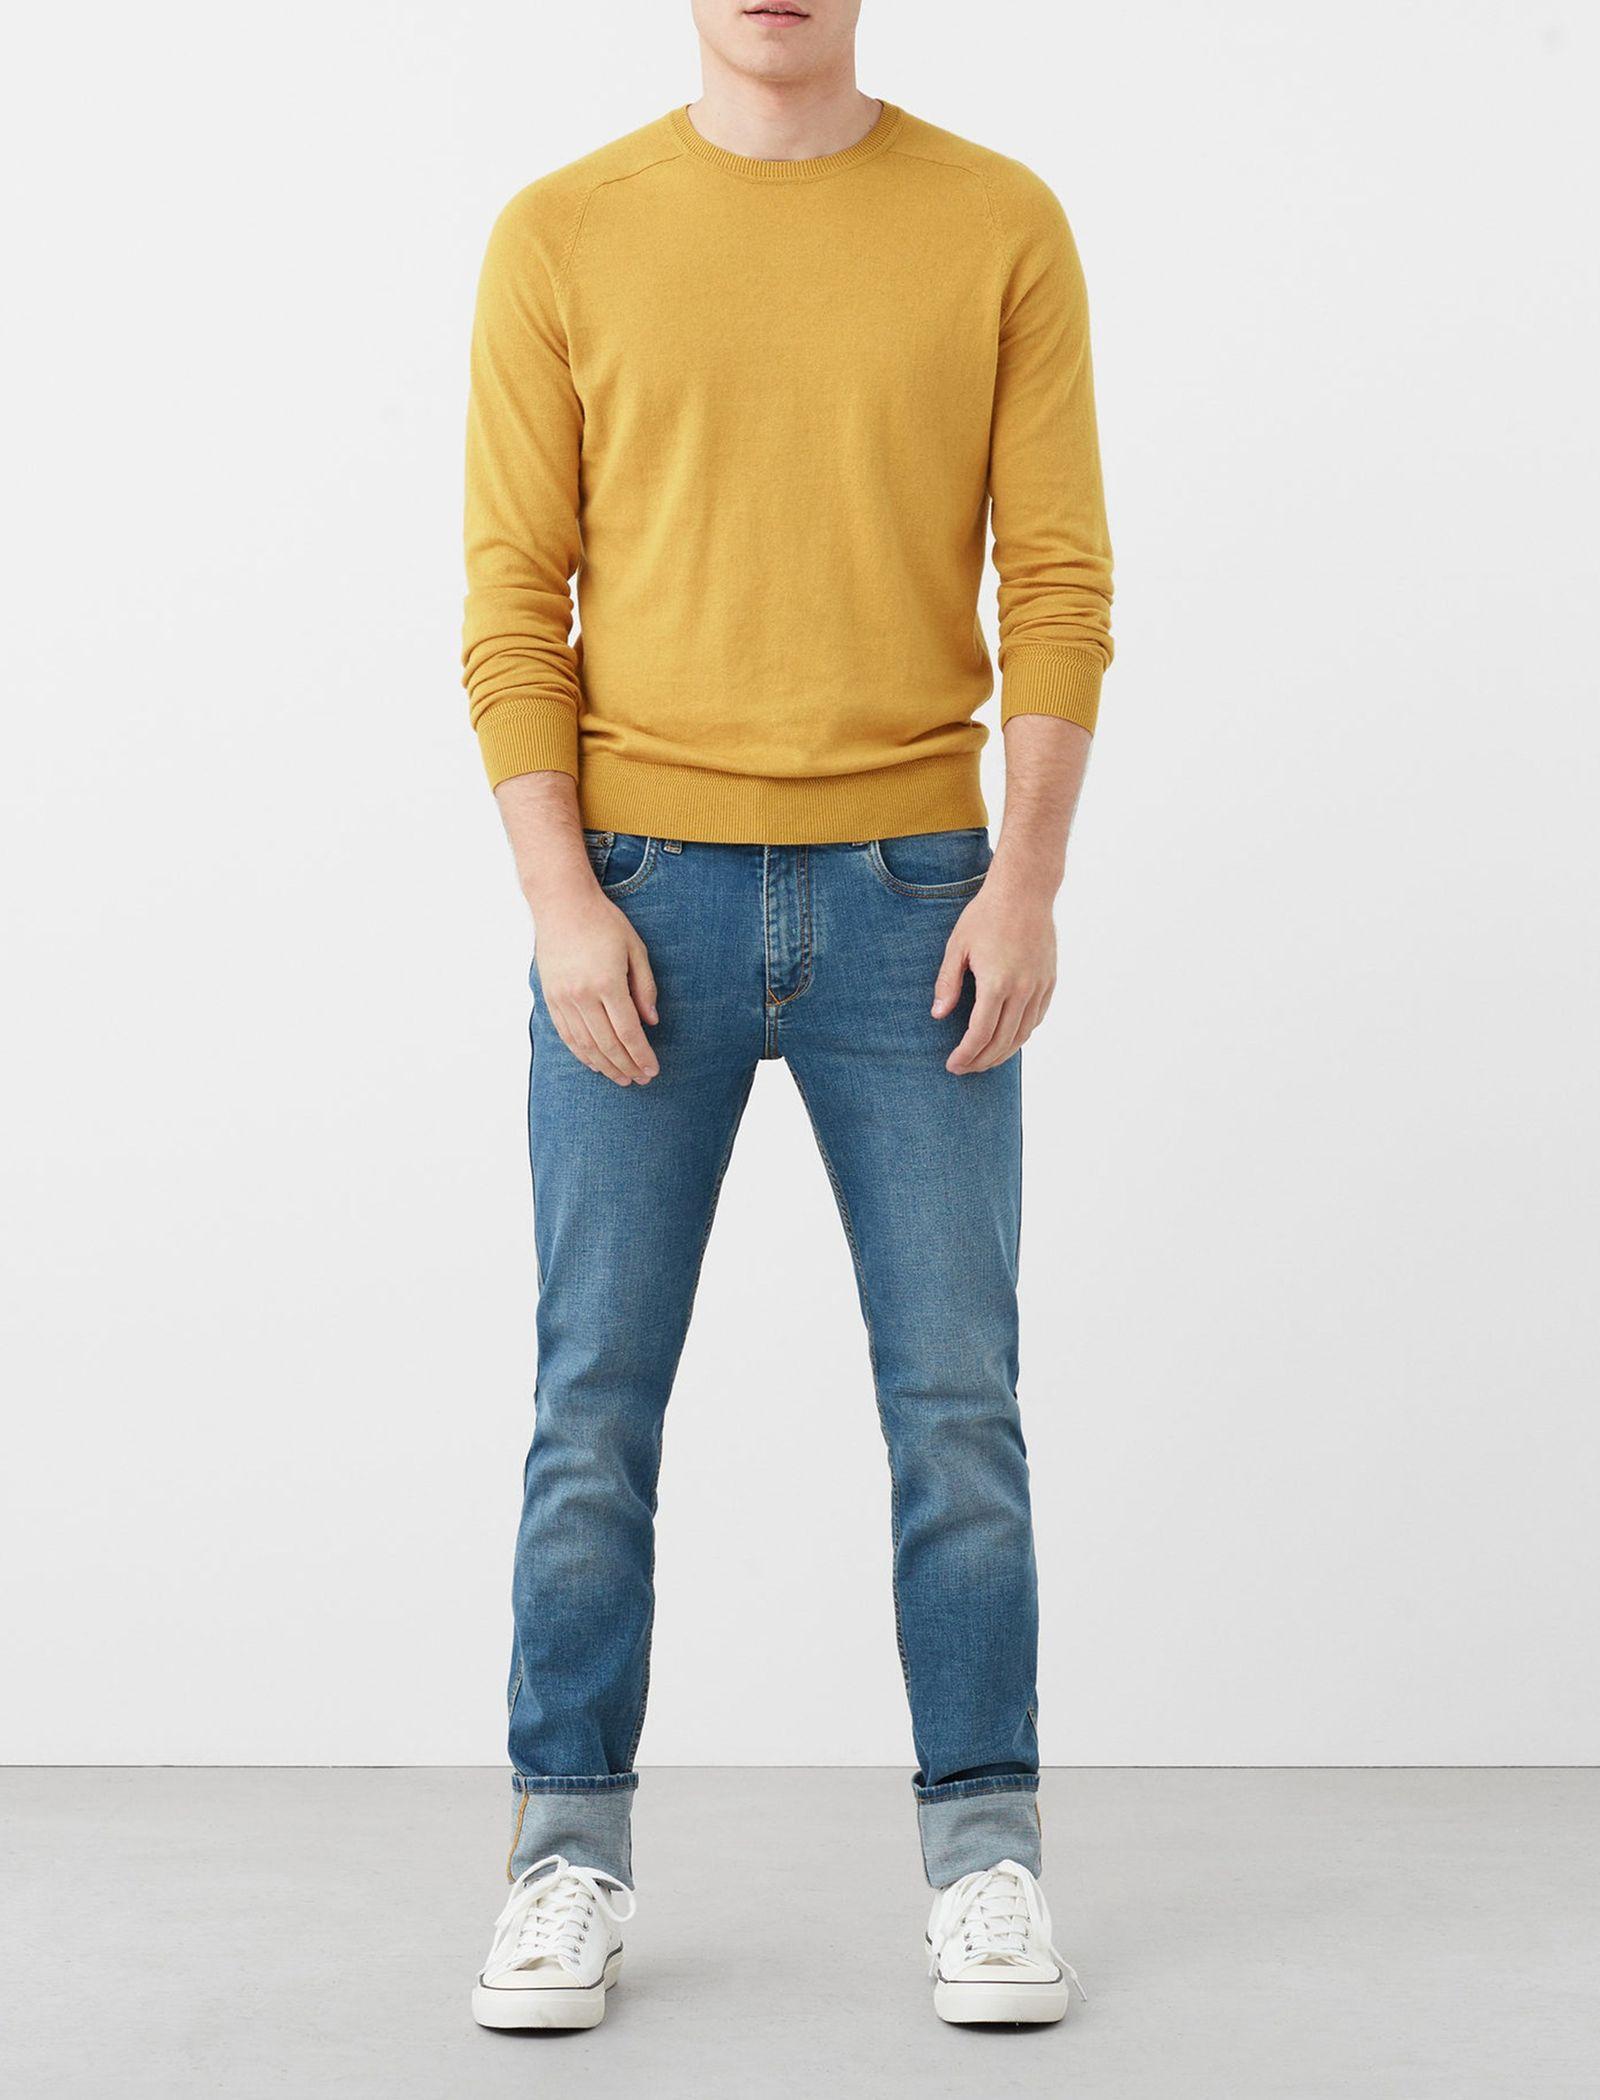 شلوار جین جذب مردانه - مانگو - آبي - 2